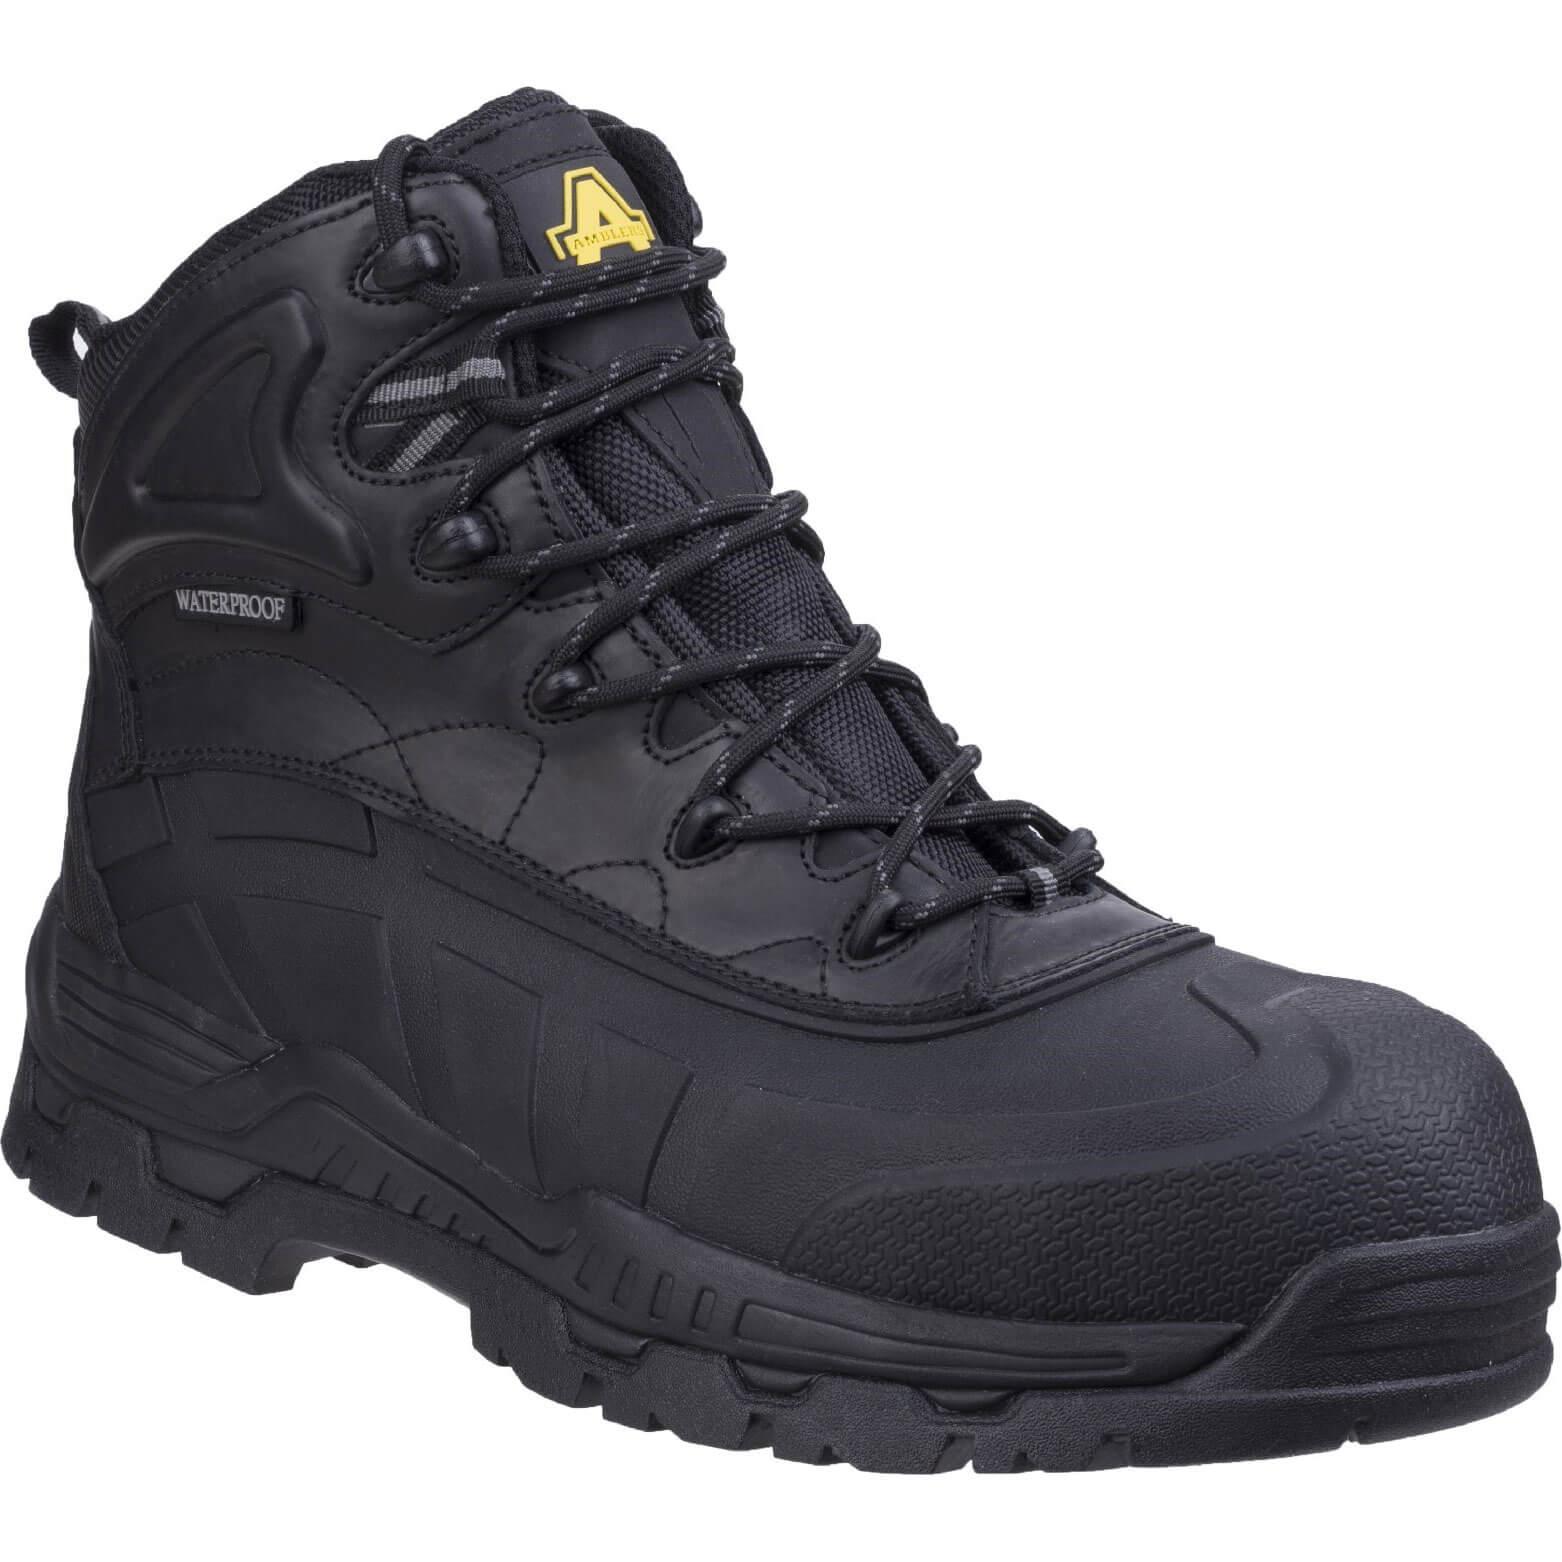 CHEAP Amblers Mens Safety FS430 Hybrid Waterproof Non-Metal Safety Boots Black Size 12 – Men's Footwear